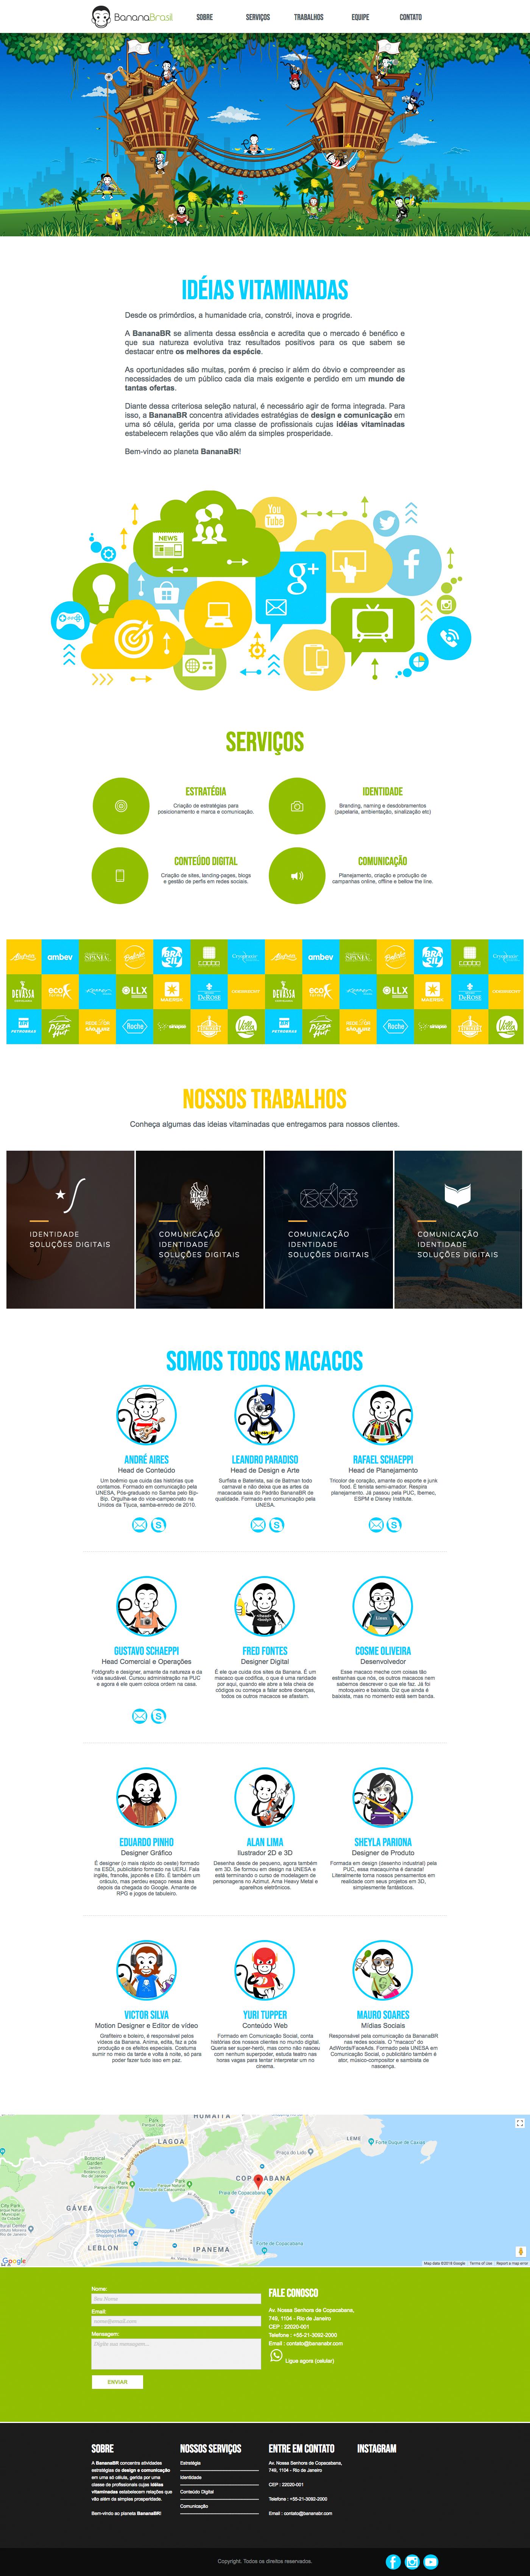 site muse Responsive Adaptive mobile agency digital Brazil